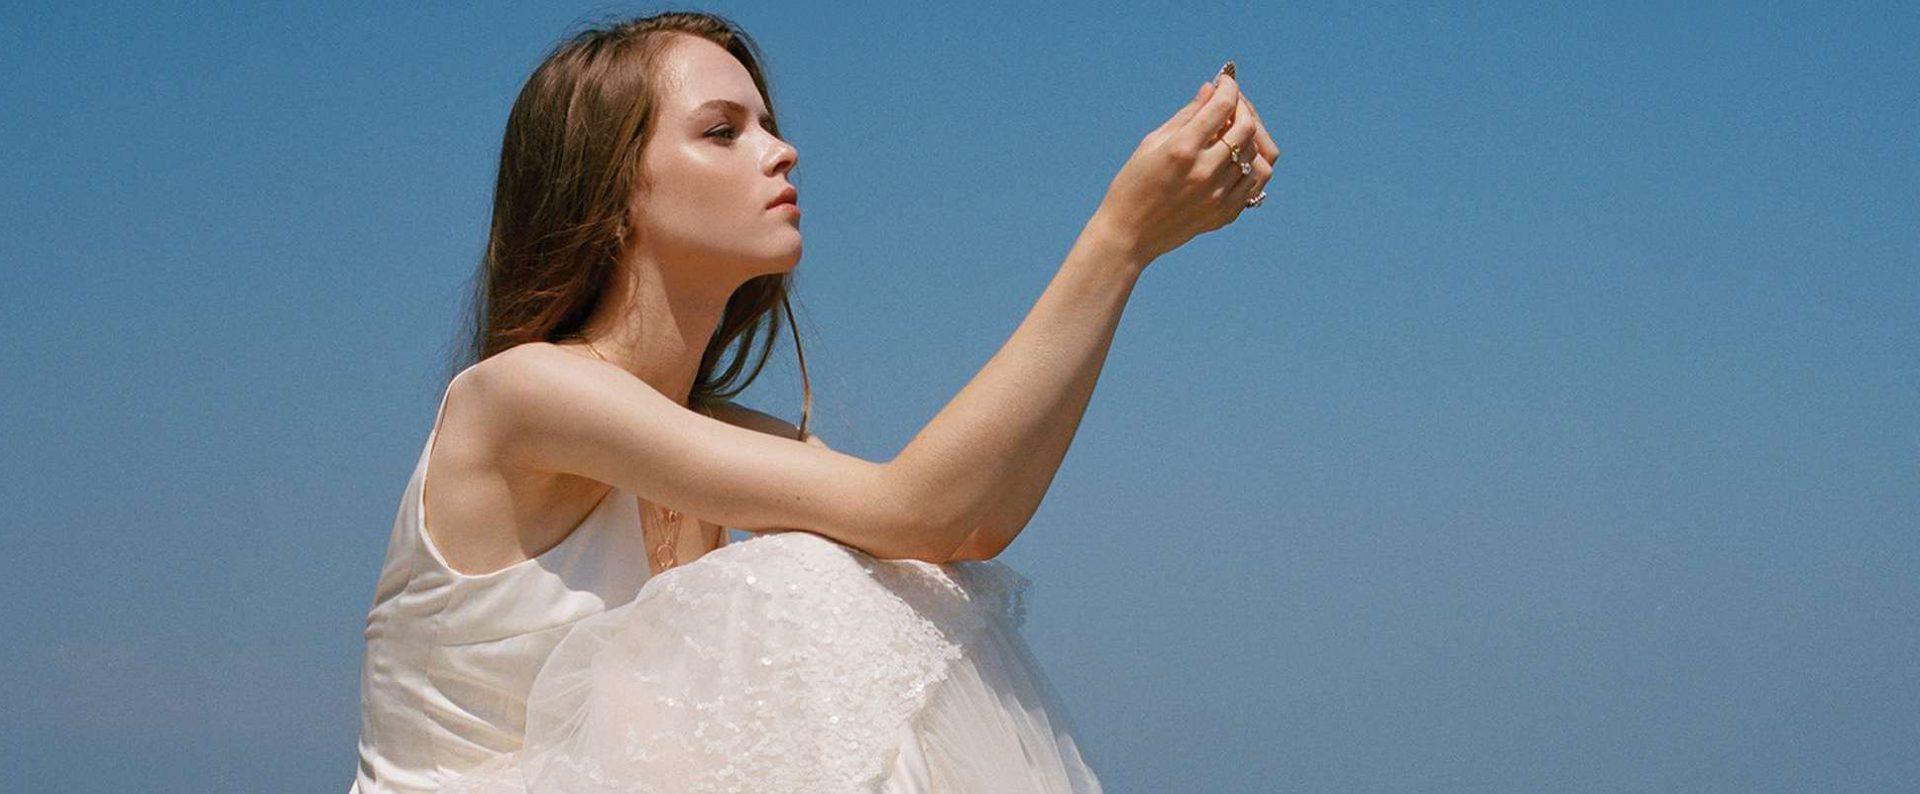 designer wedding dress savannah miller paris france P